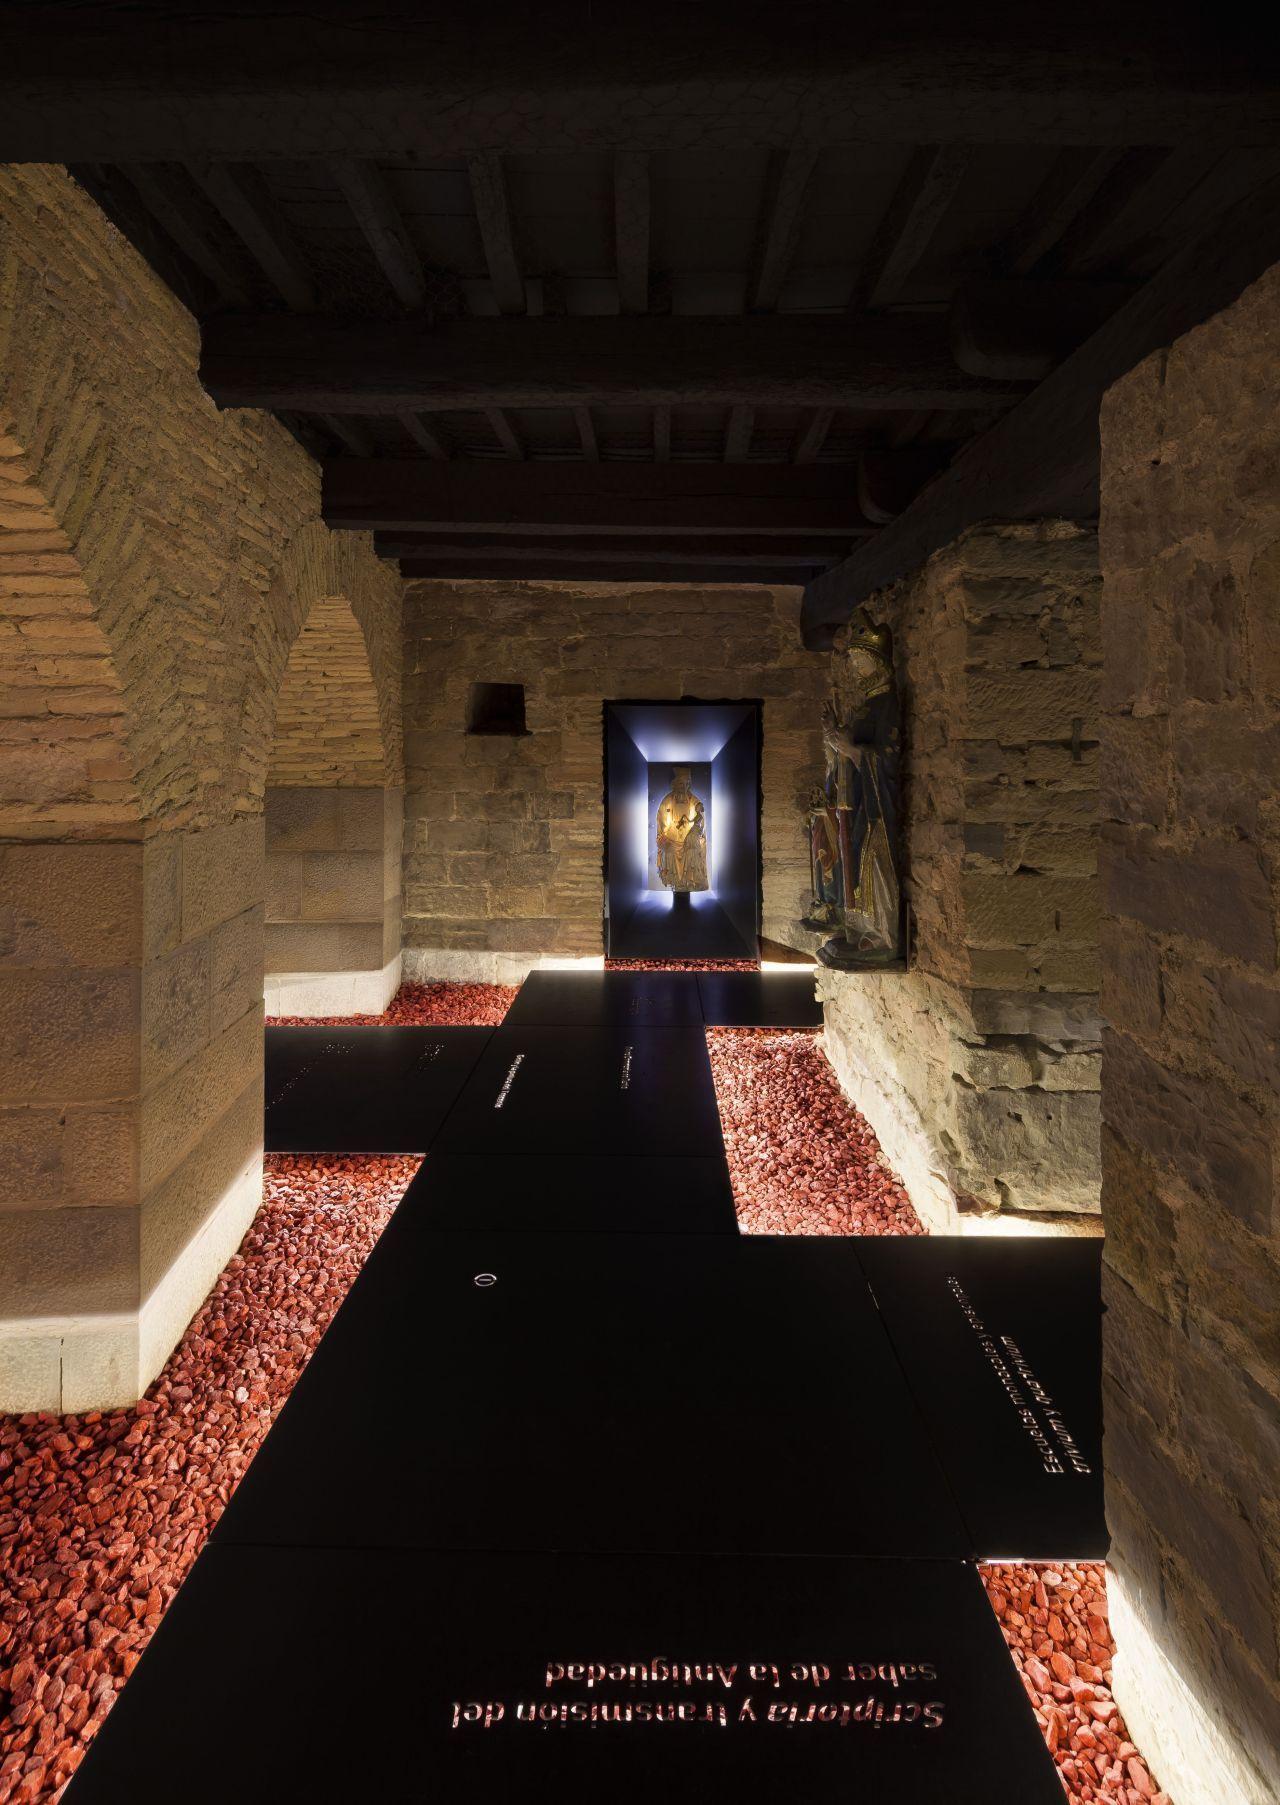 Occidens Museum / Vaillo + Irigaray